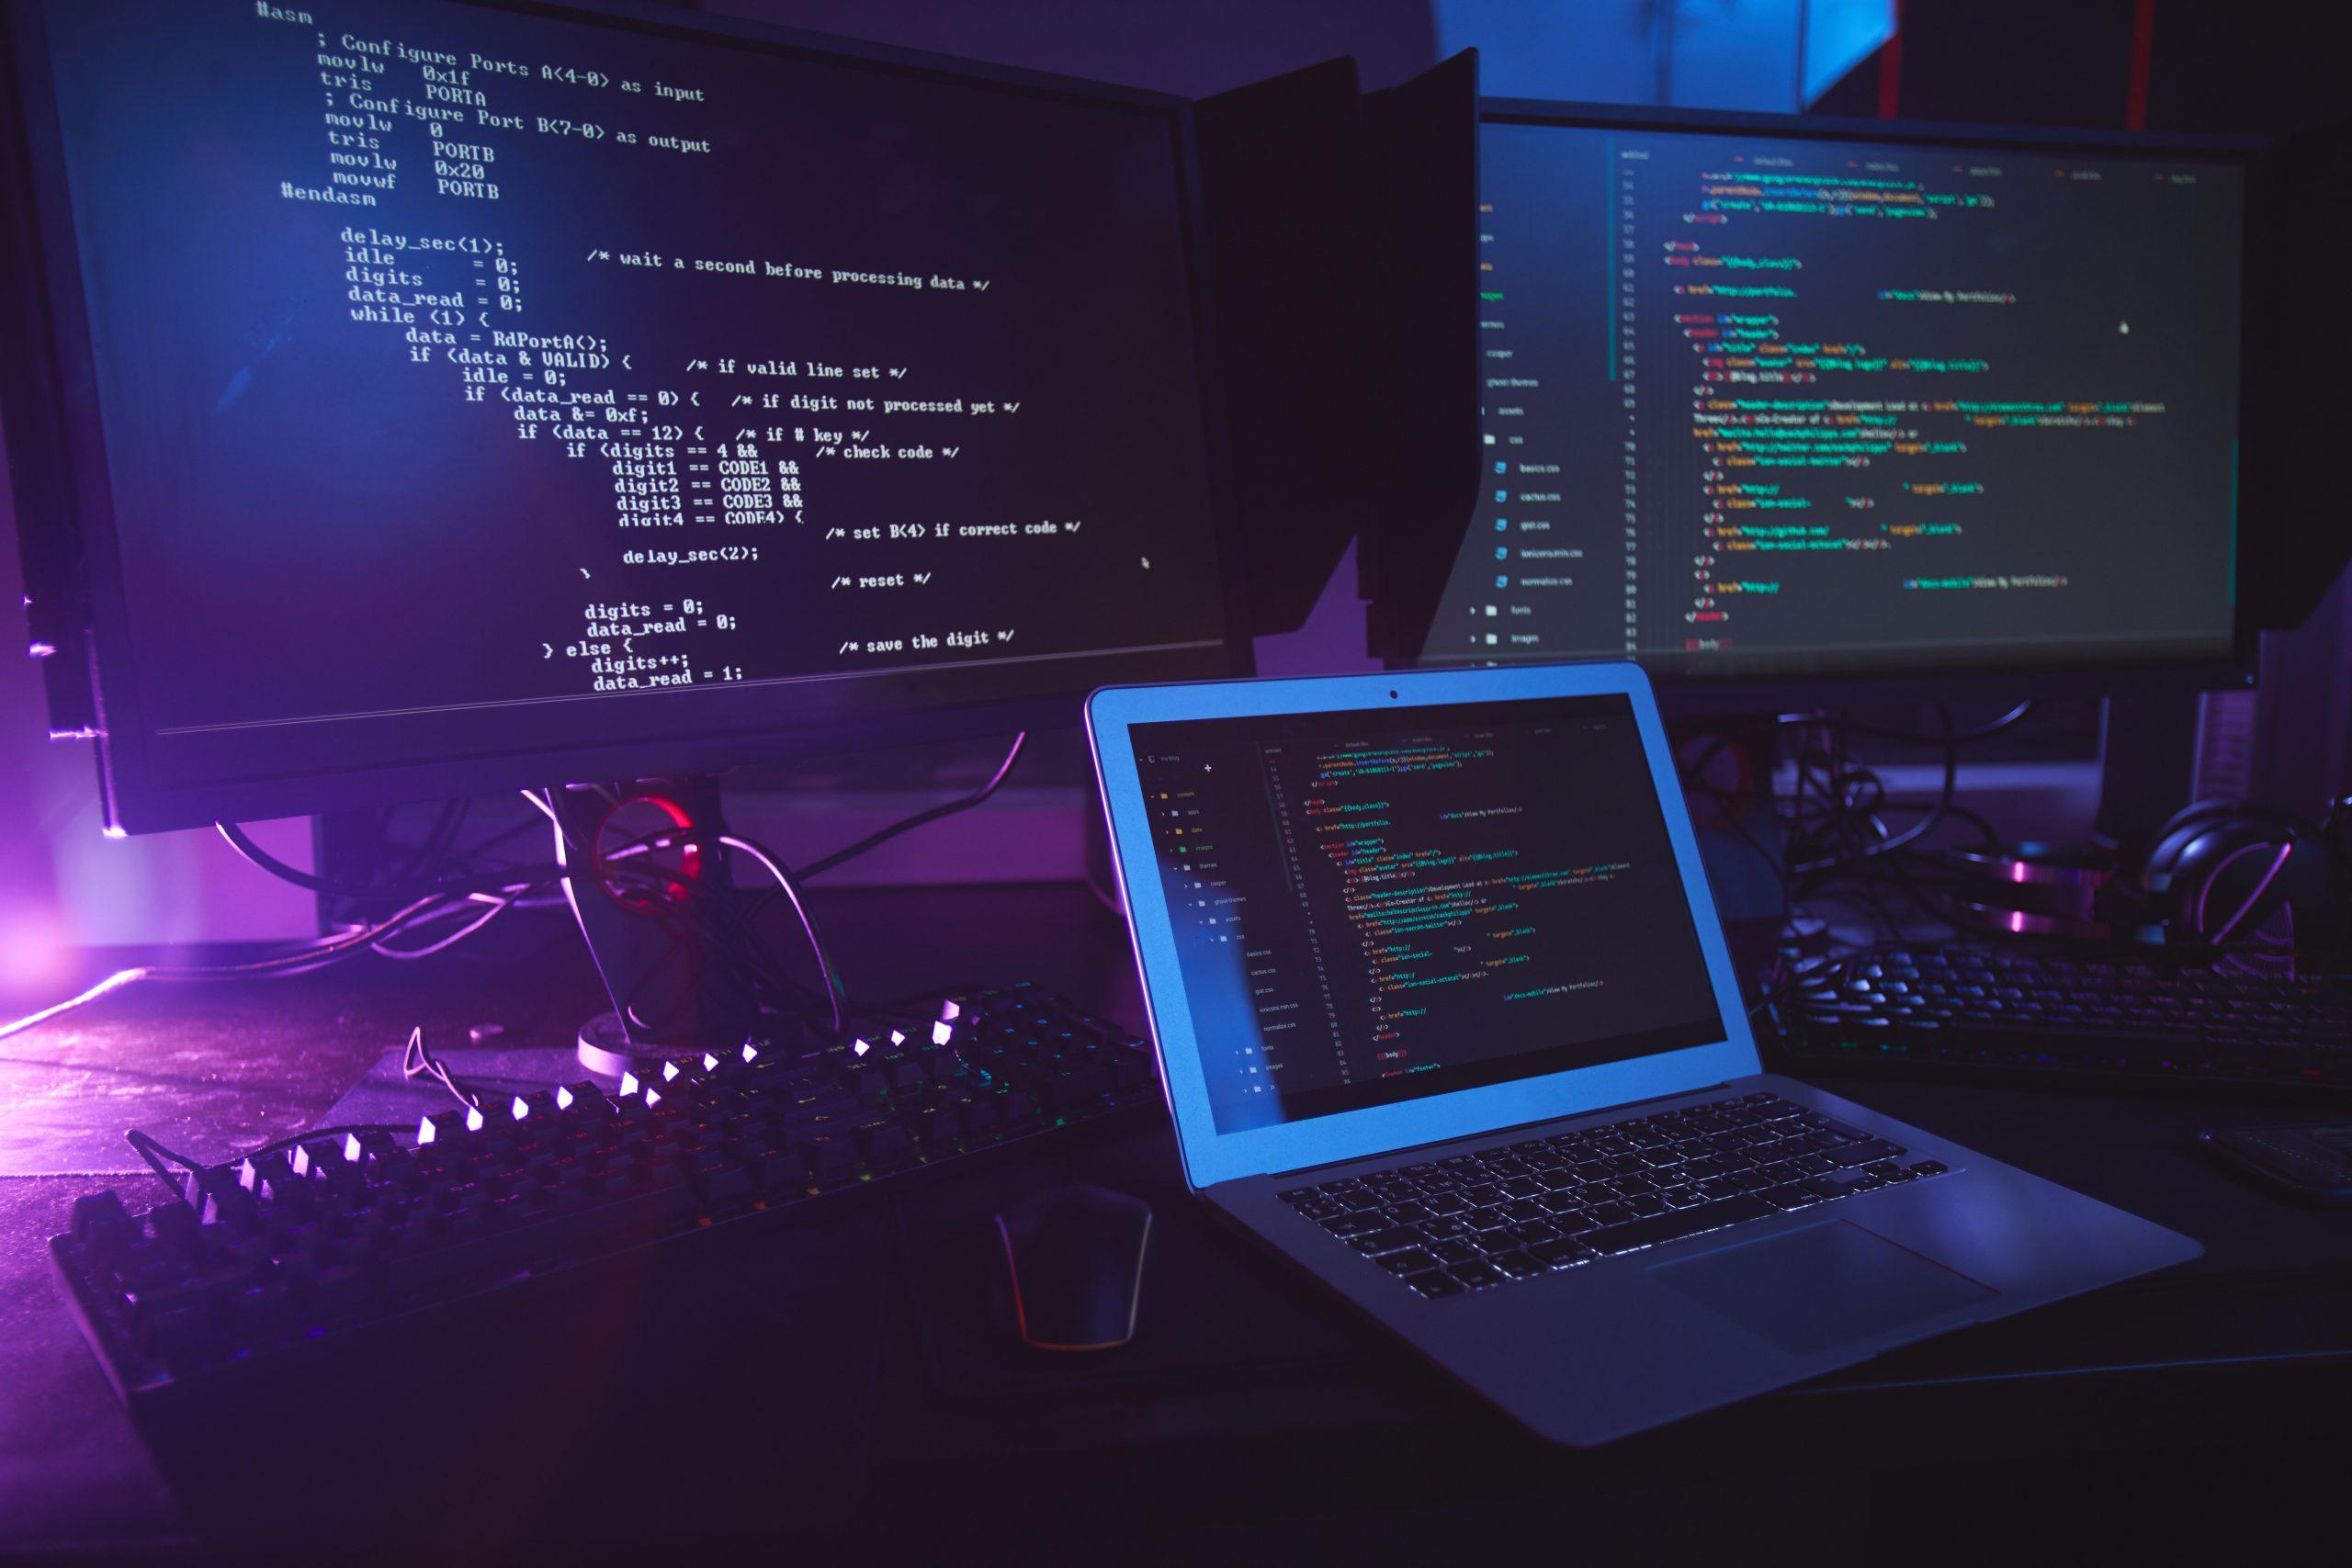 programming-equipment-in-dark-QV6ZLV7-scaled.jpg